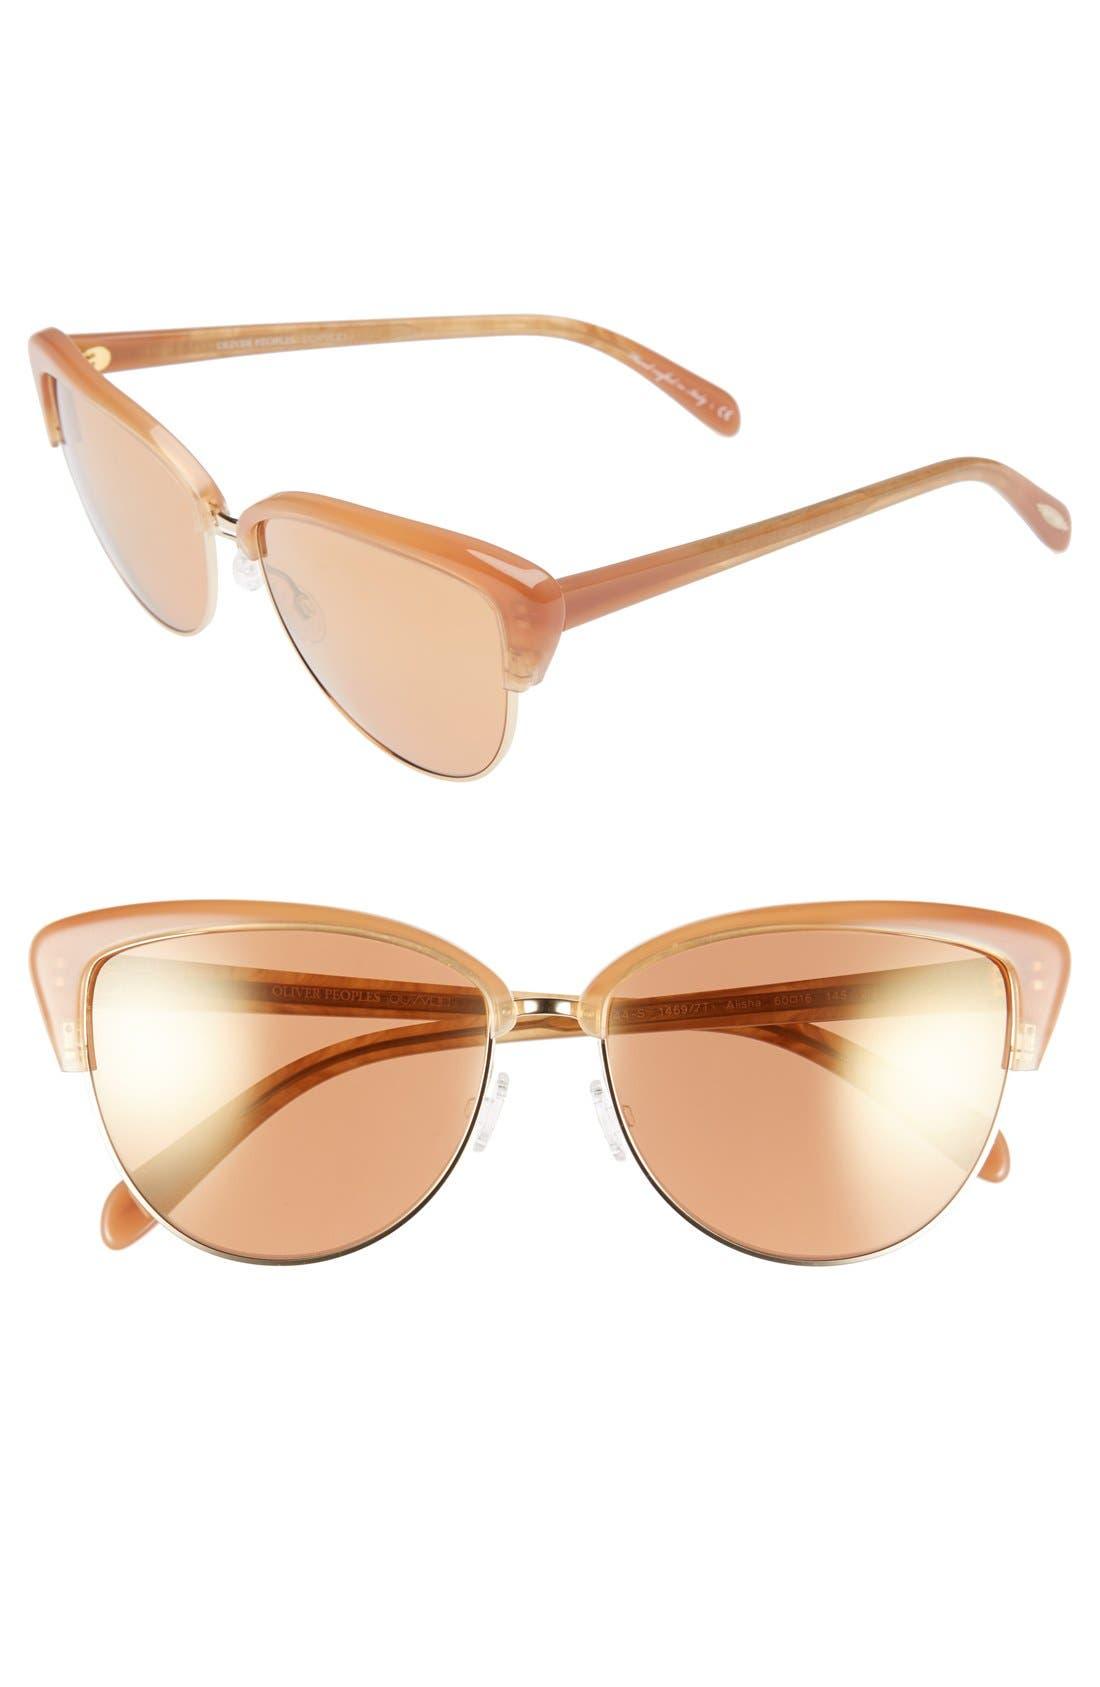 Alternate Image 1 Selected - Oliver Peoples 'Alisha' 60mm Sunglasses